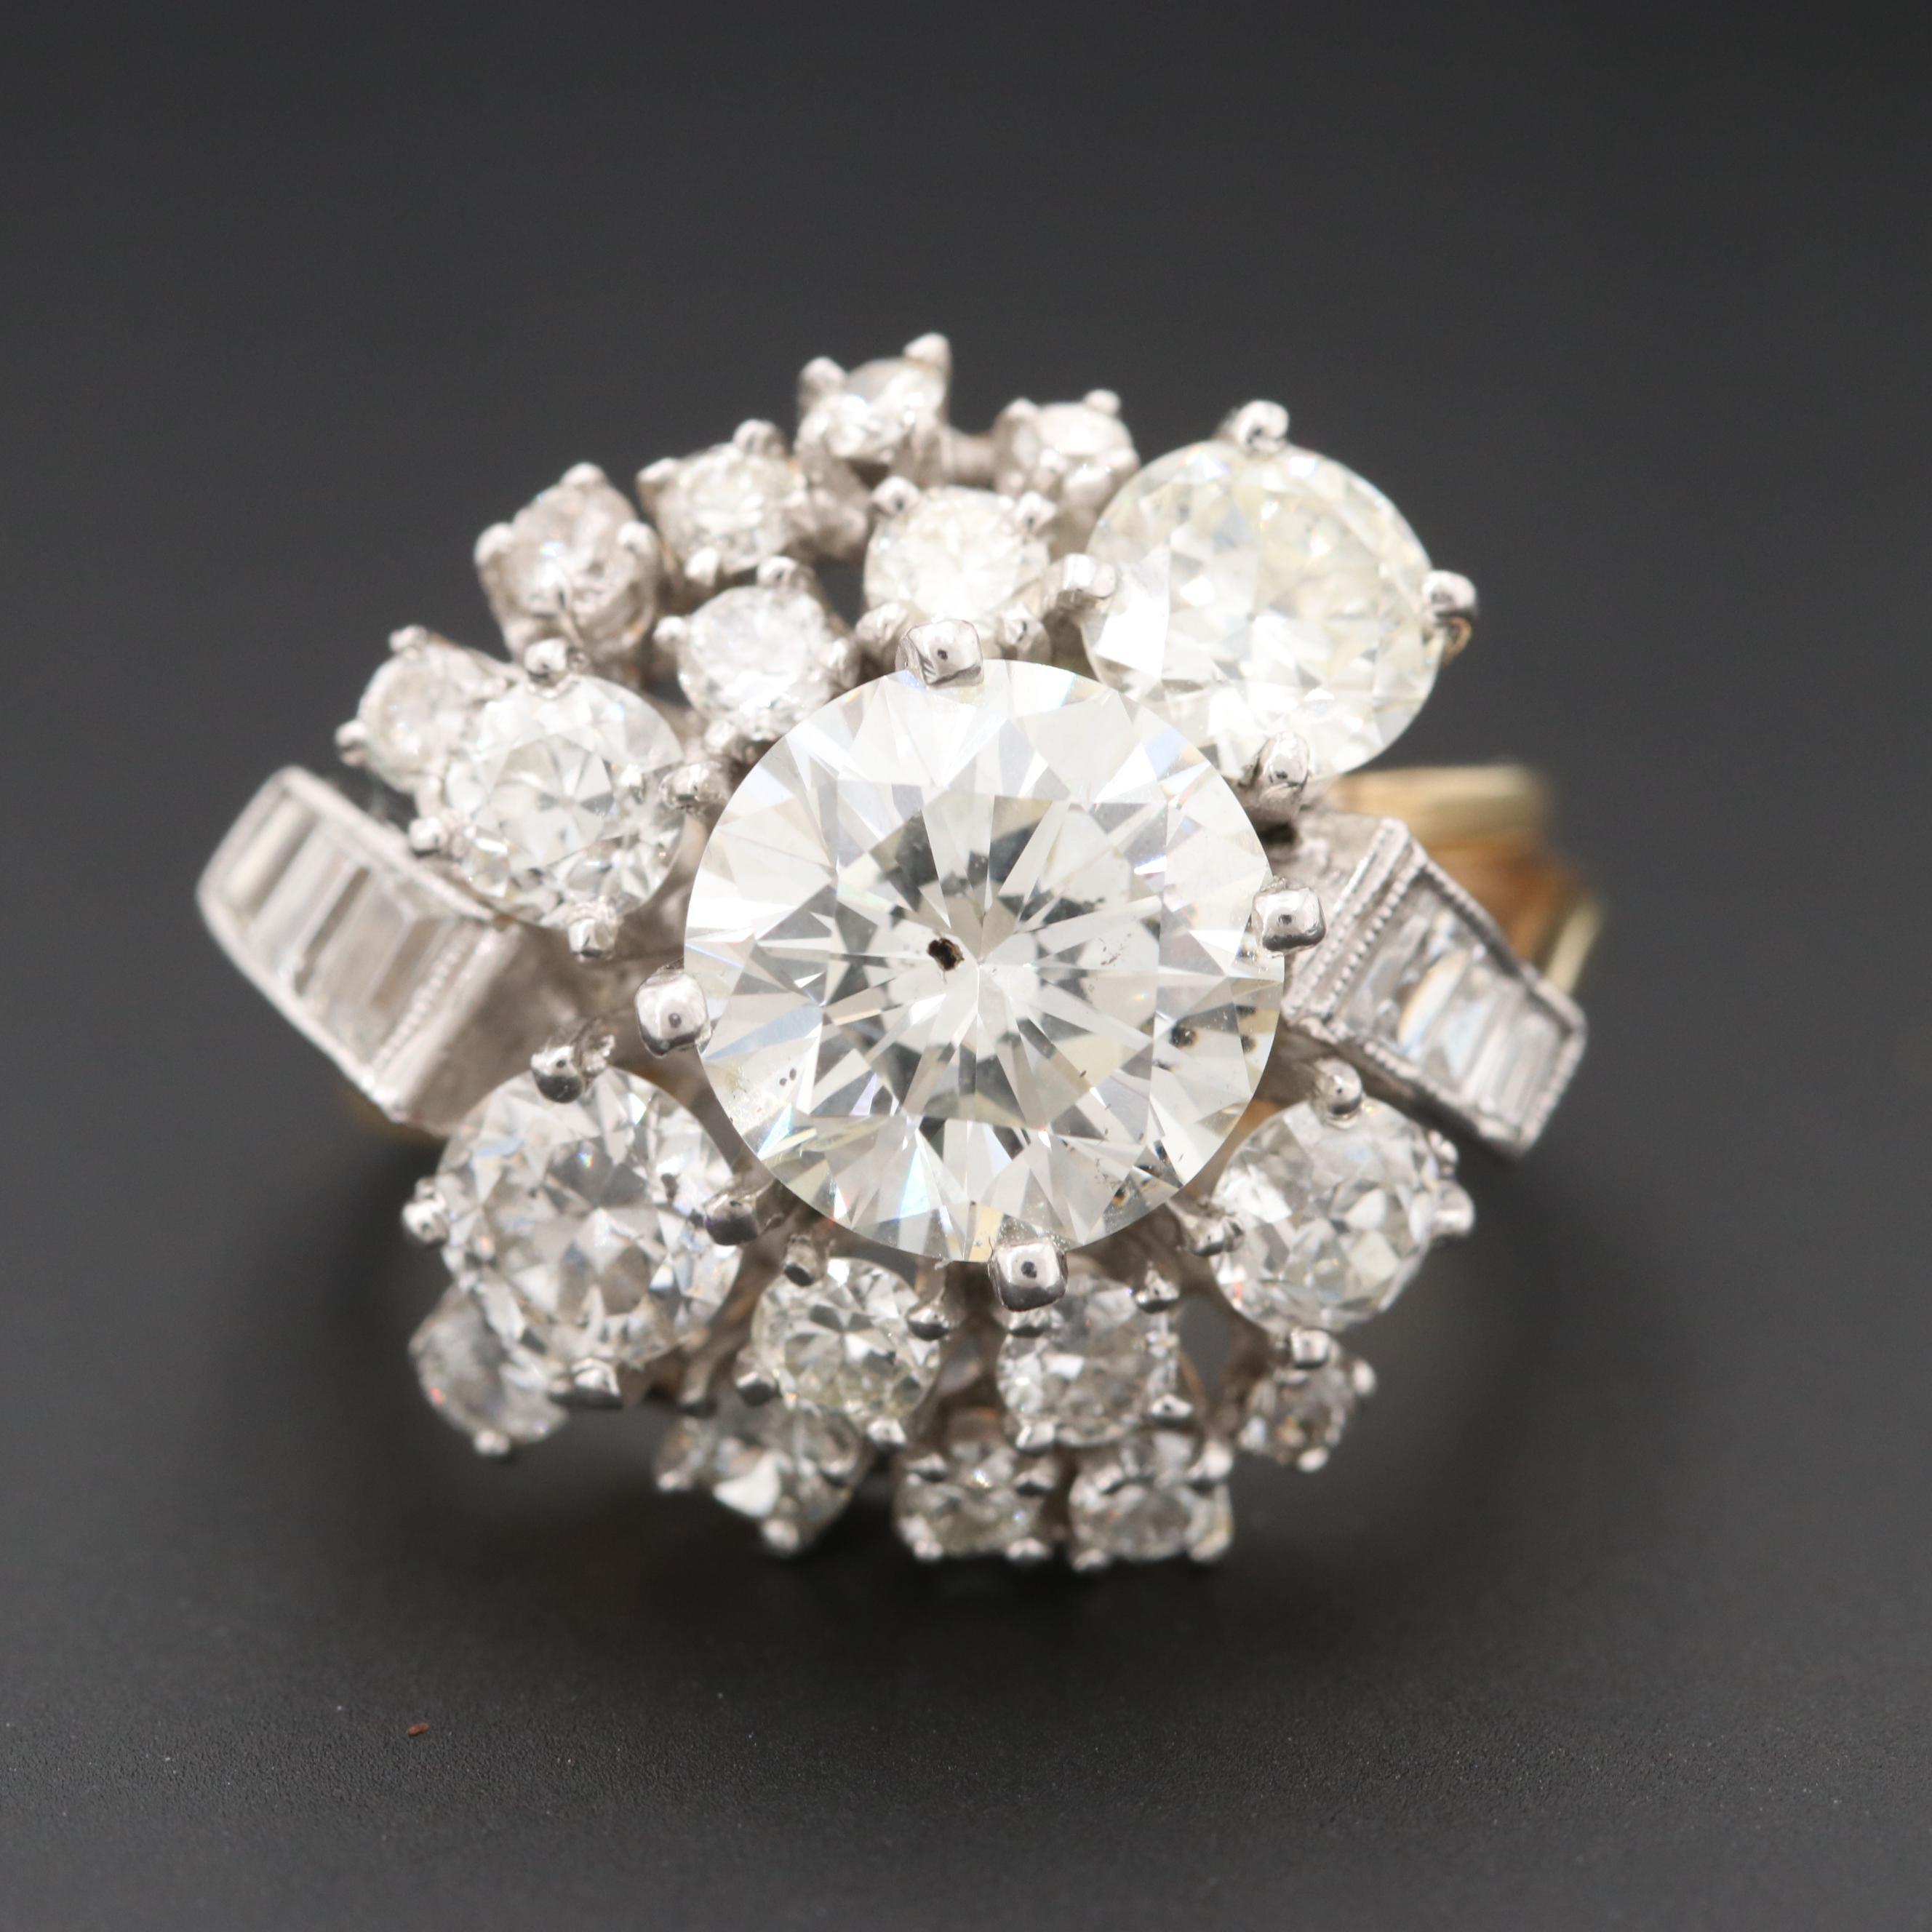 14K Yellow Gold and Palladium 3.99 CTW Diamond Ring